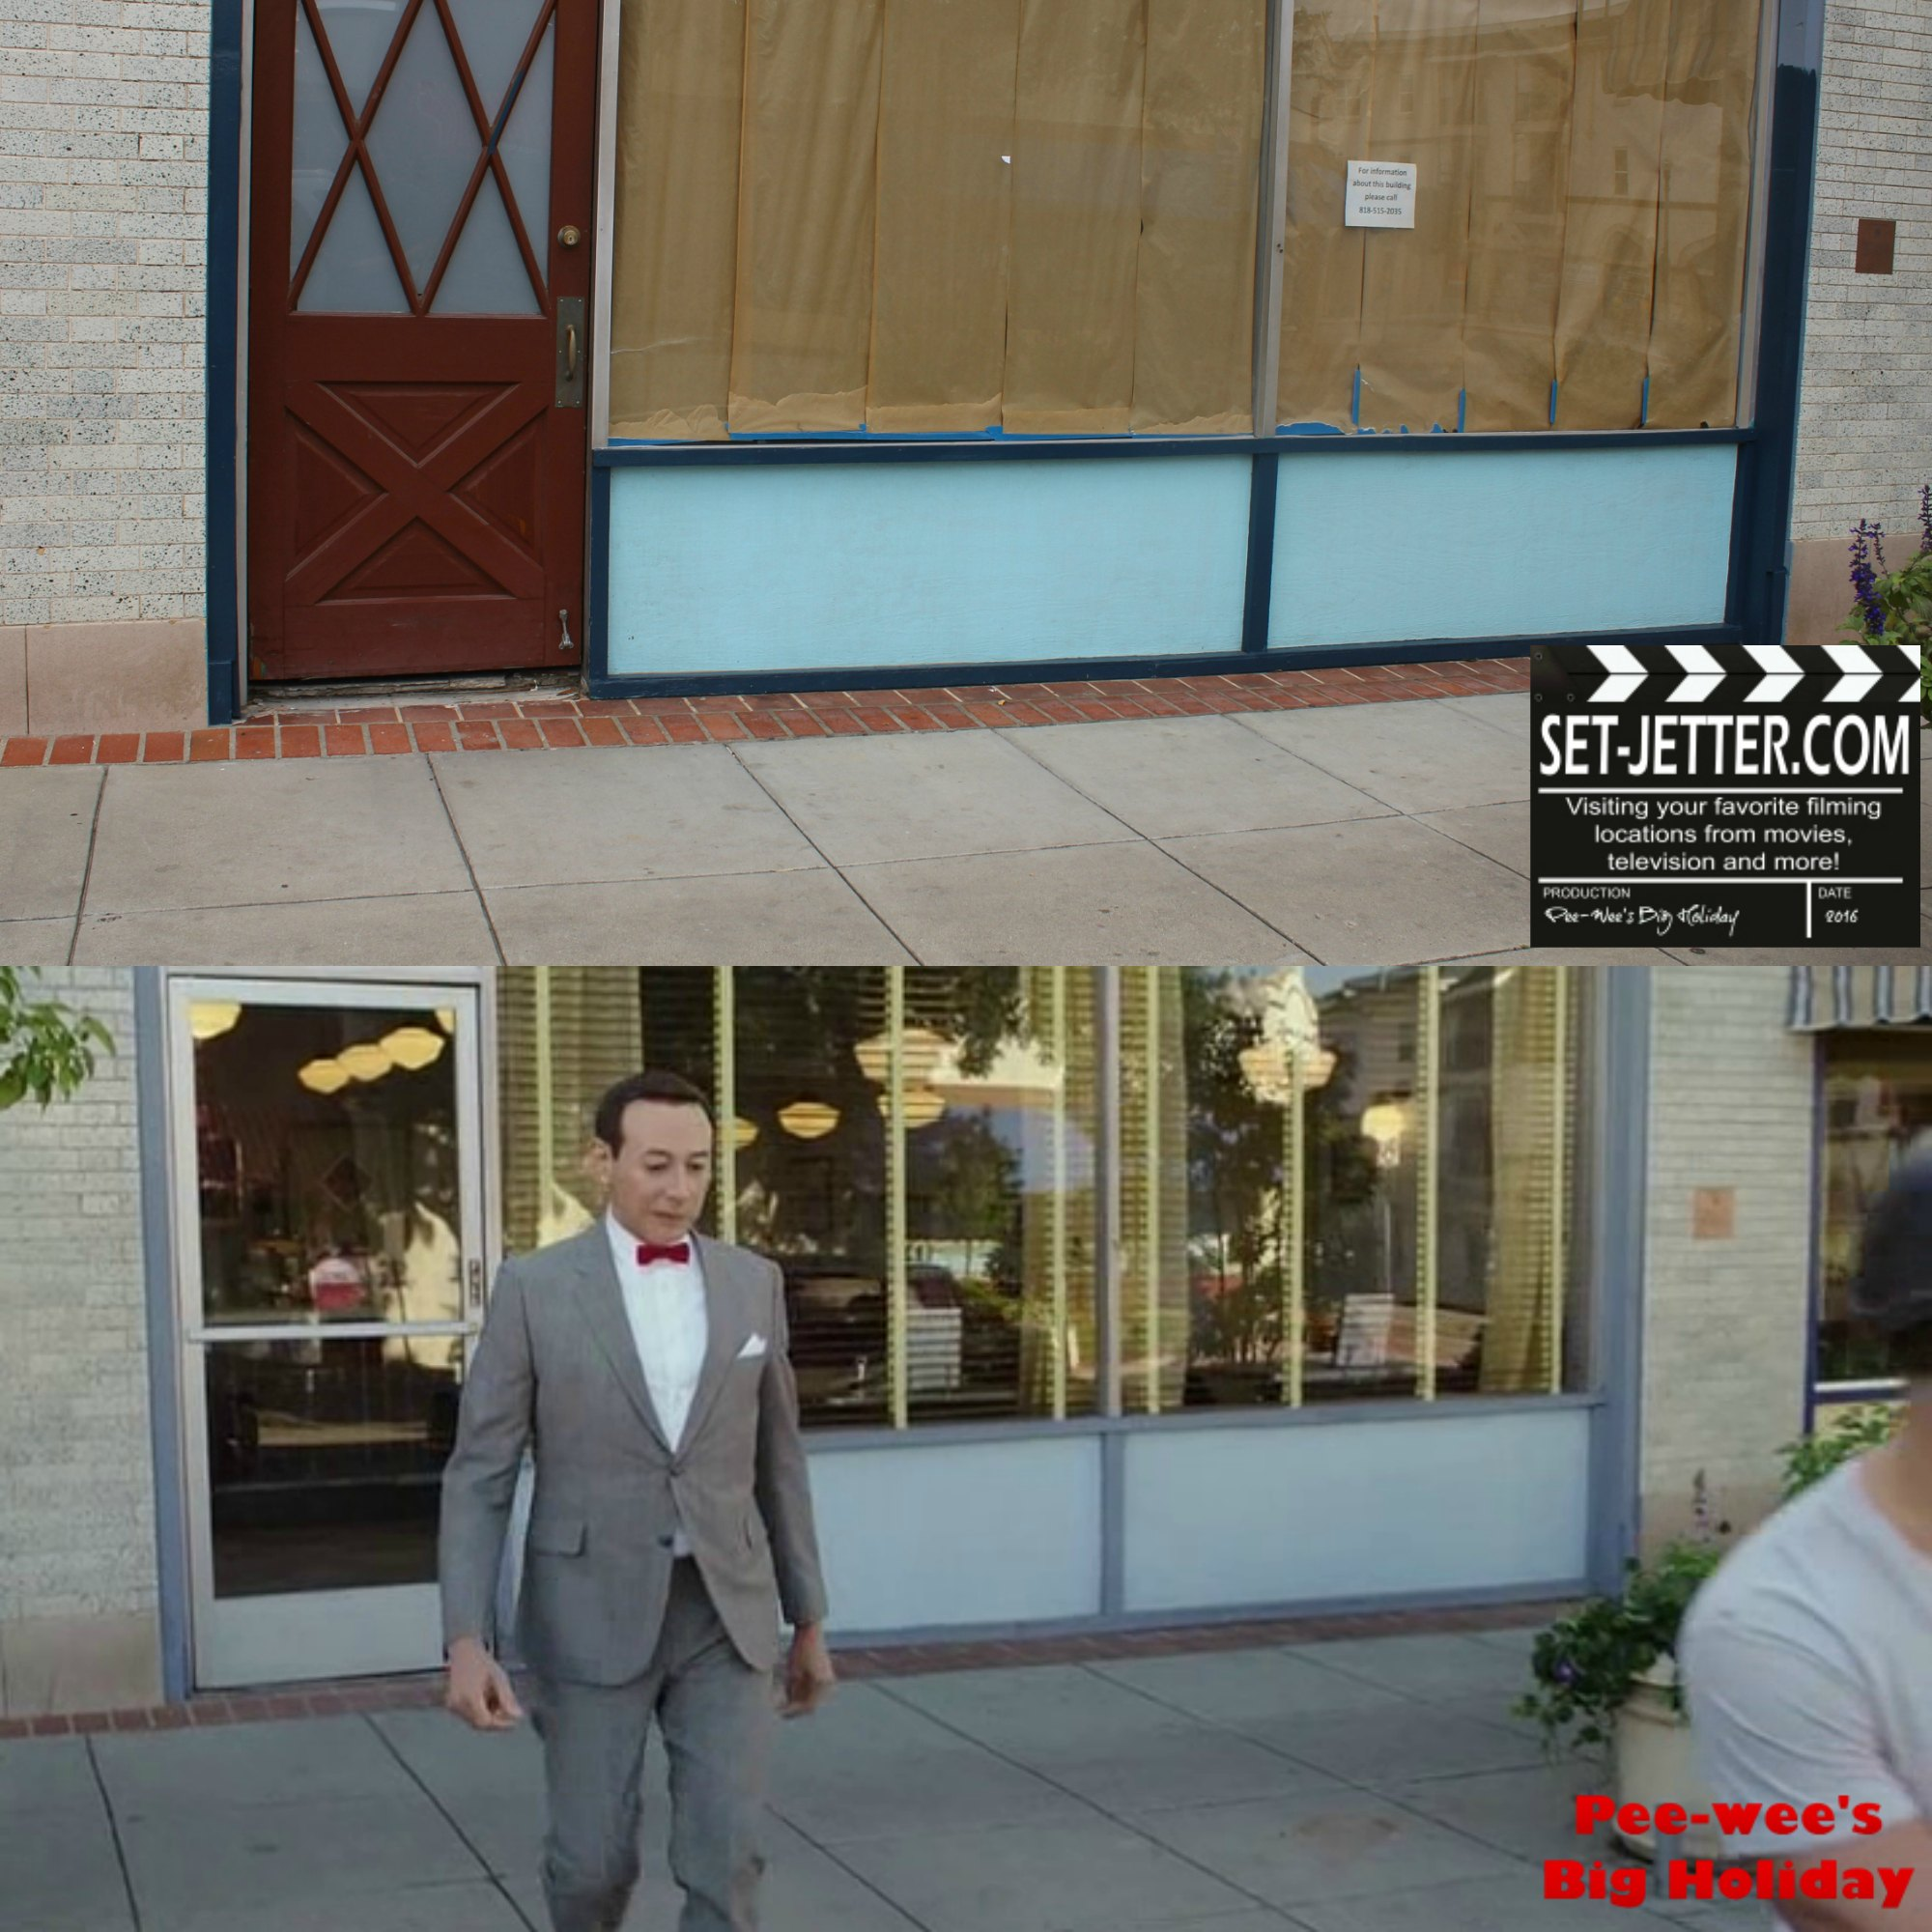 Pee Wee's Big Holiday comparison 297.jpg